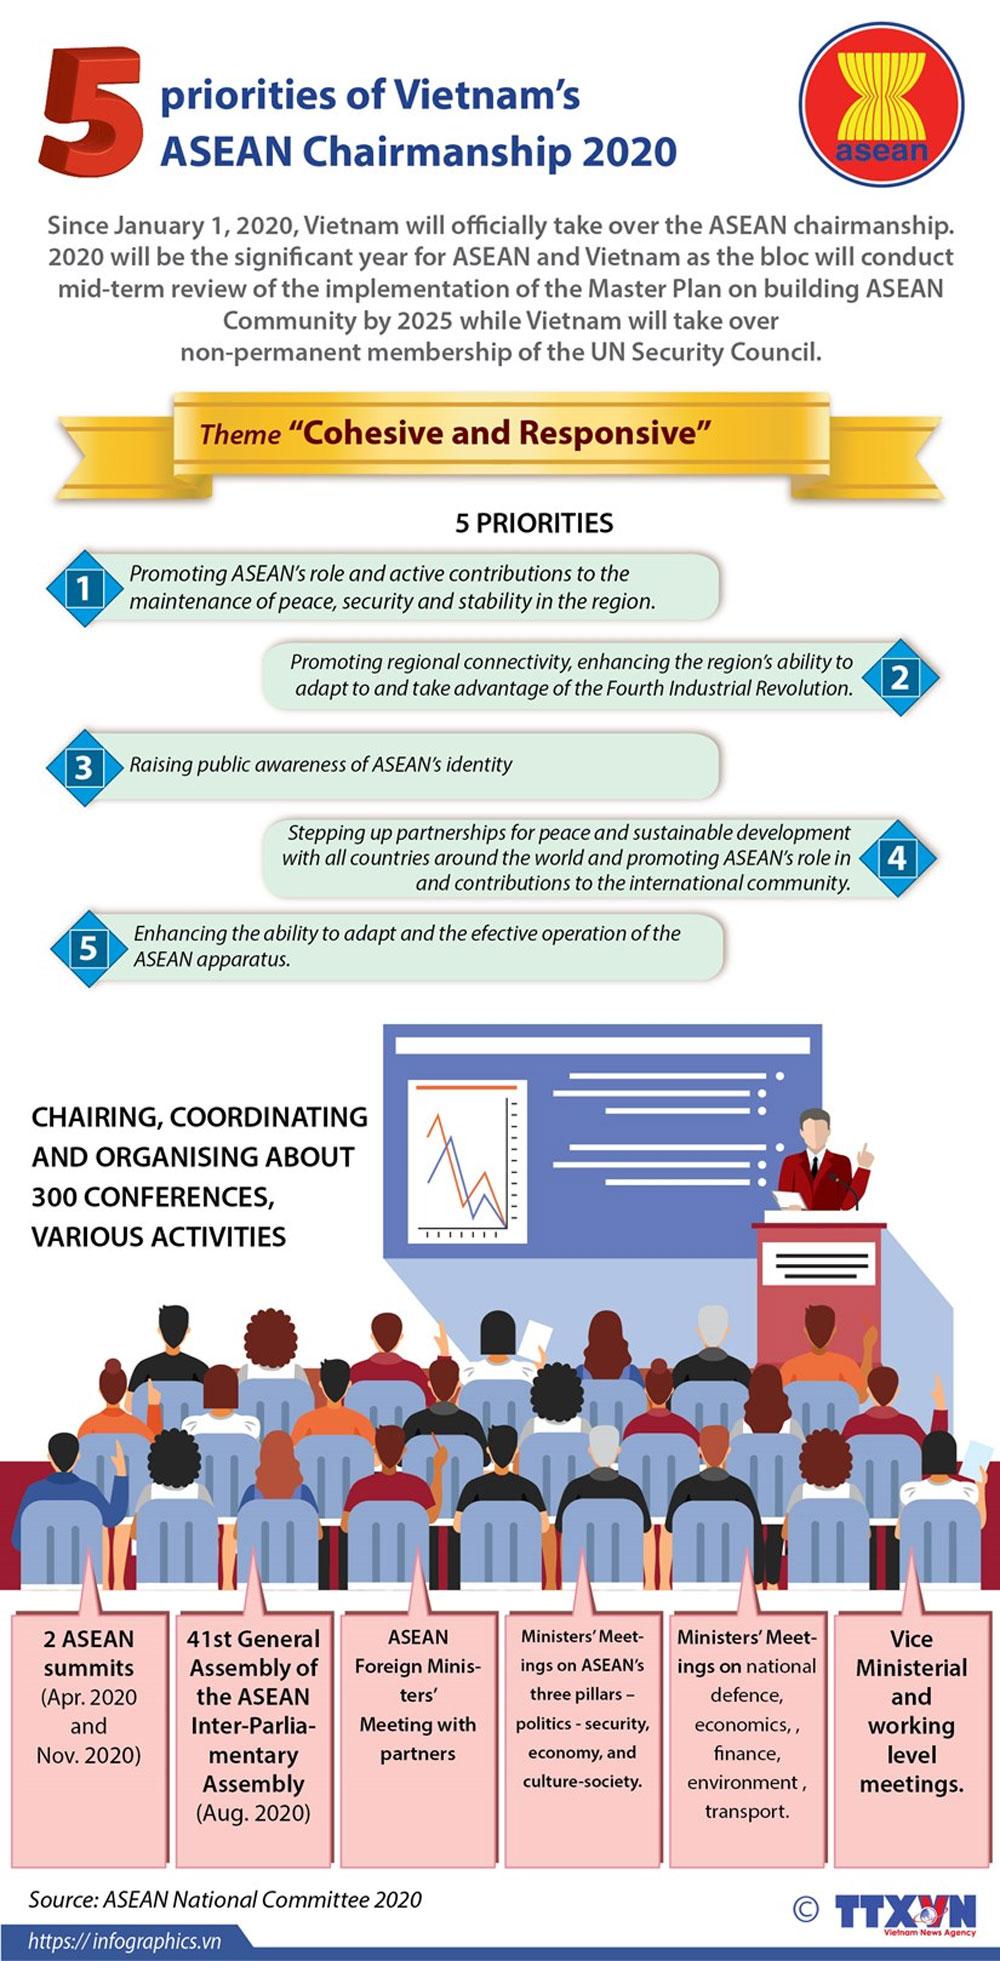 Five priorities, Vietnam, ASEAN Chairmanship 2020, significant year,  ASEAN Community